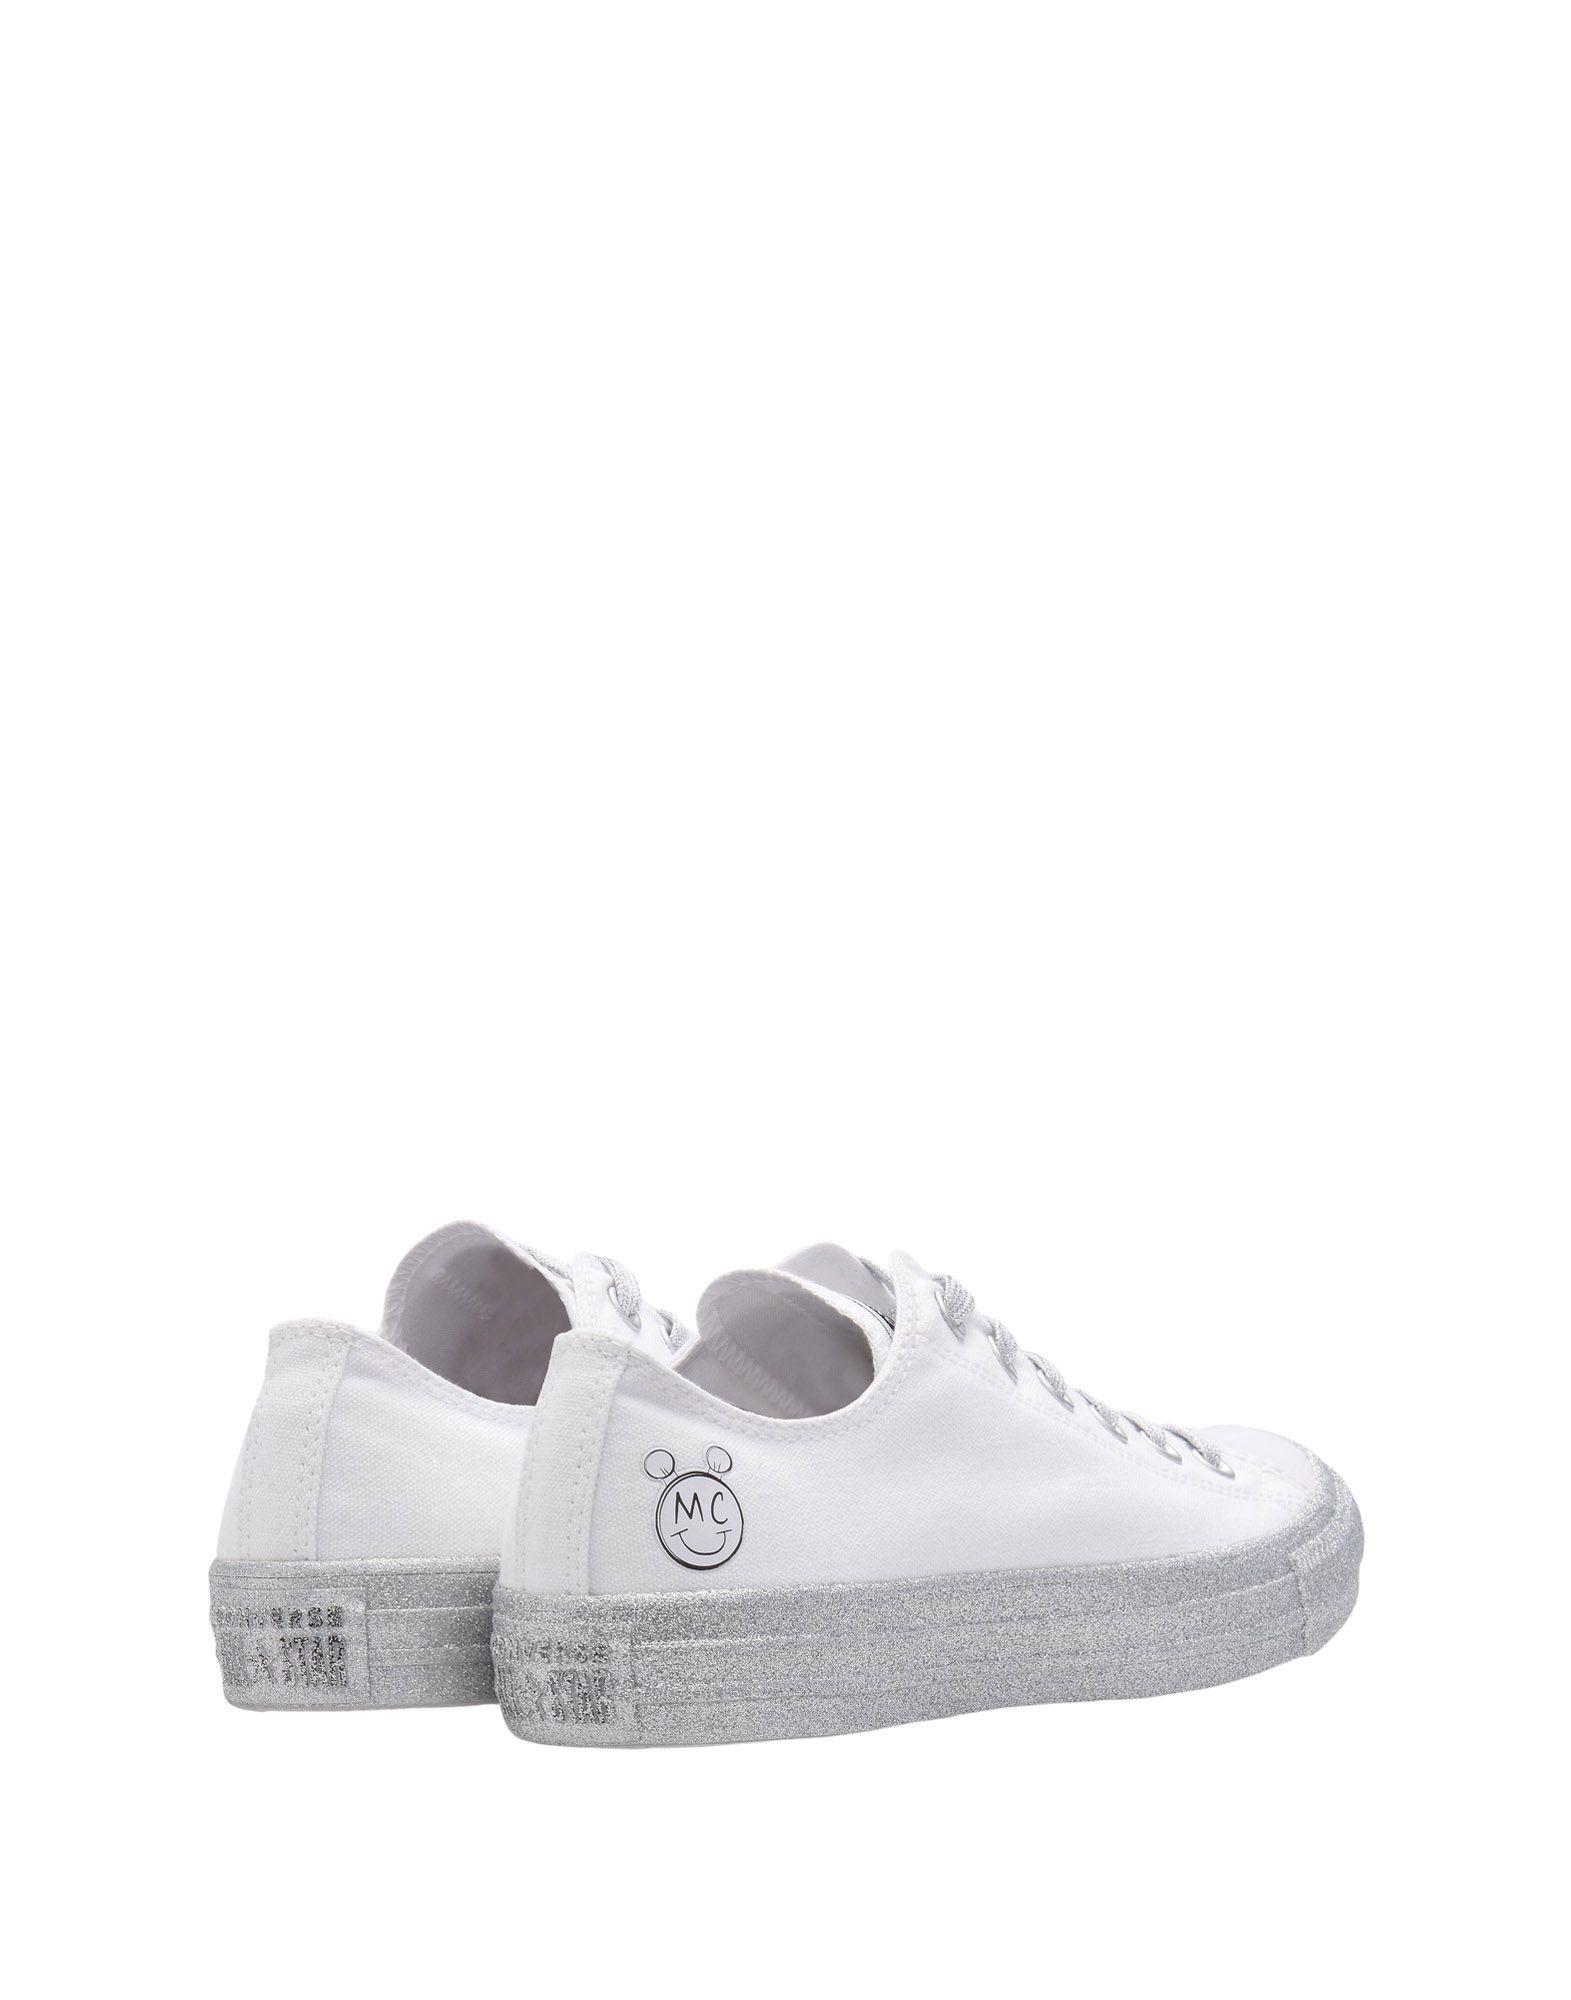 Sneakers Converse X Miley Cyrus Ctas Ox White/Pure 11493630FU Platinum/Black - Donna - 11493630FU White/Pure 899914